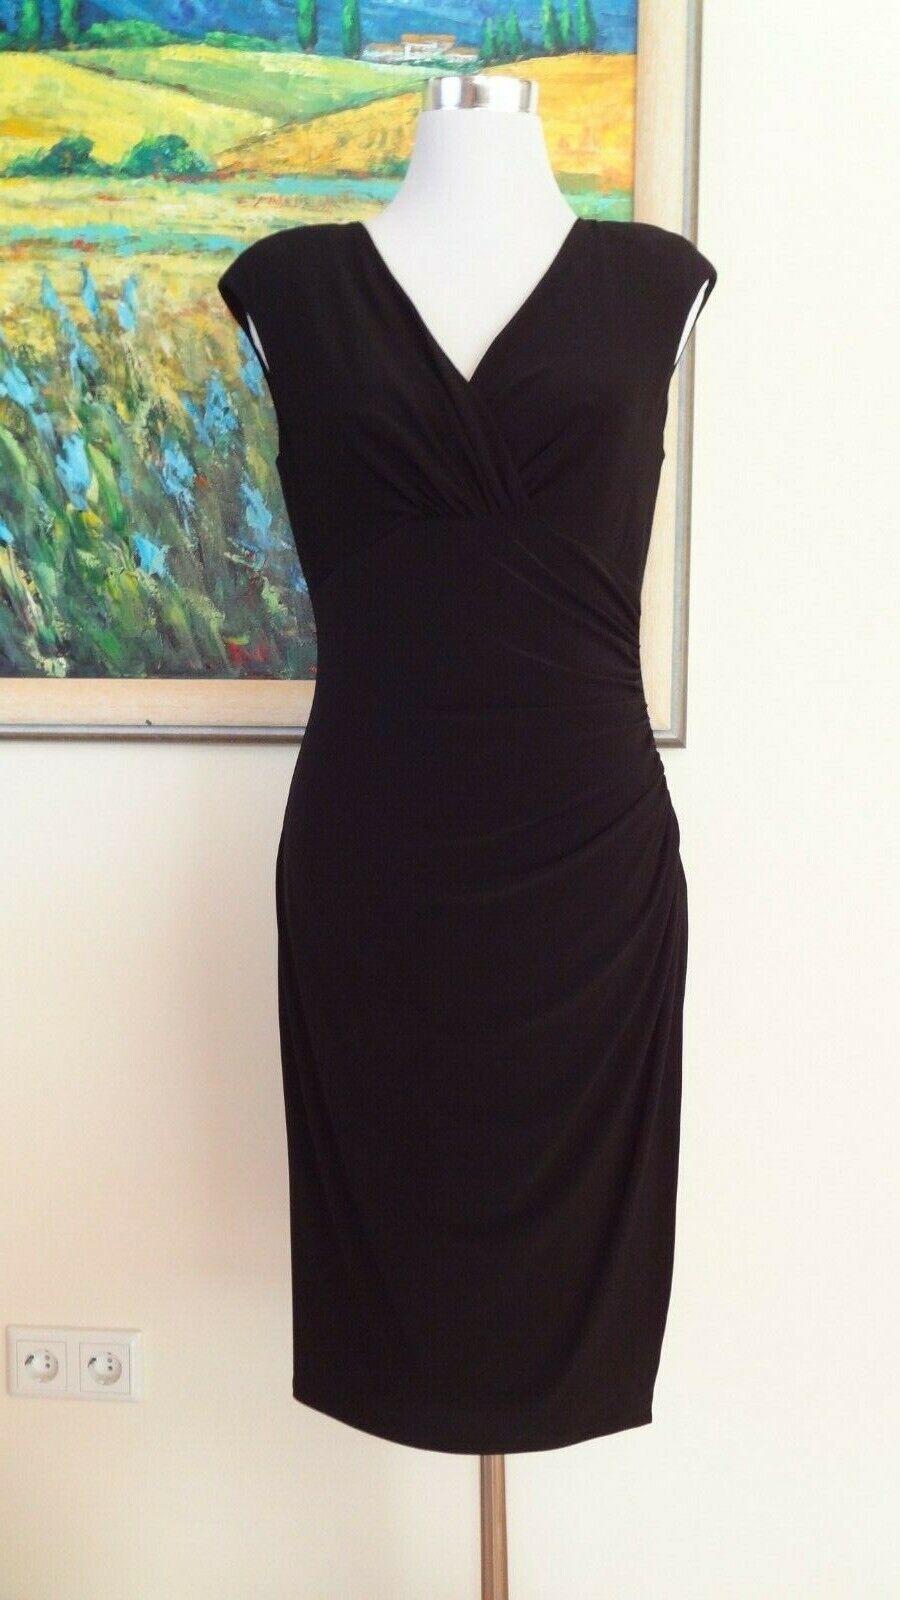 Kleid RALPH LAUREN Gr. 8 Dress schwarz Etuikleid Cocktailkleid